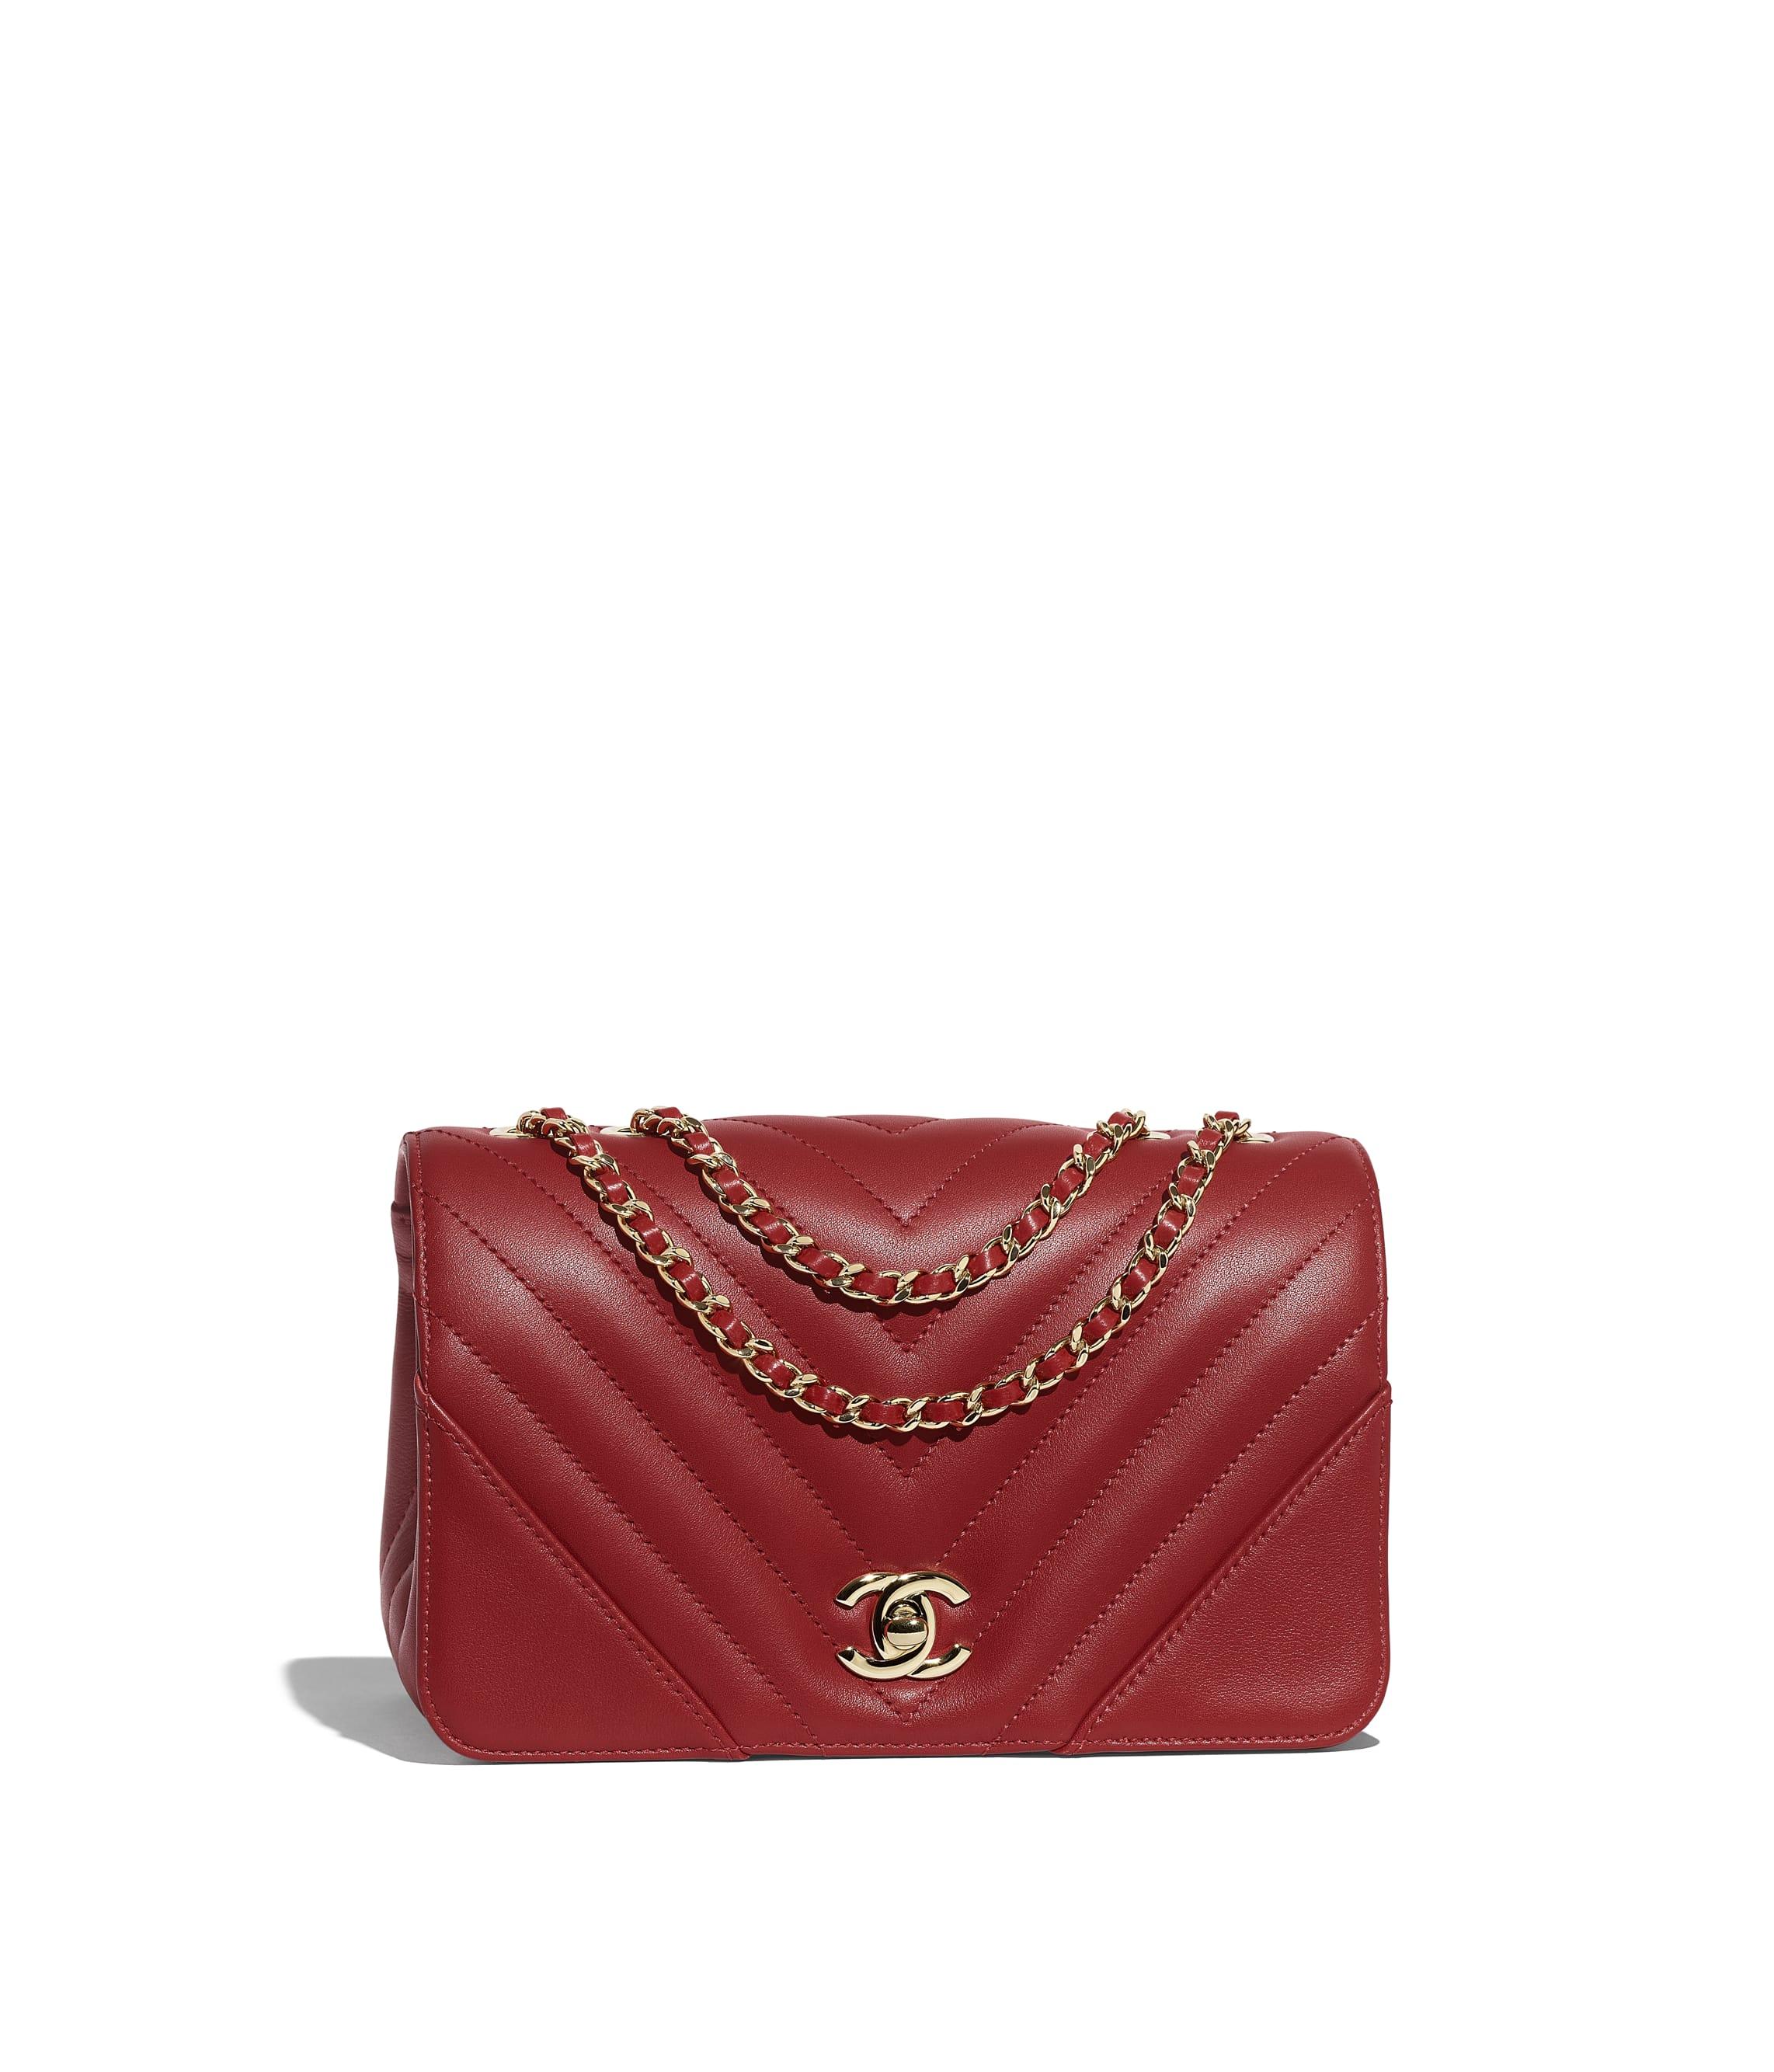 Mini Flap Bag Calfskin Gold Tone Metal Red Chanel